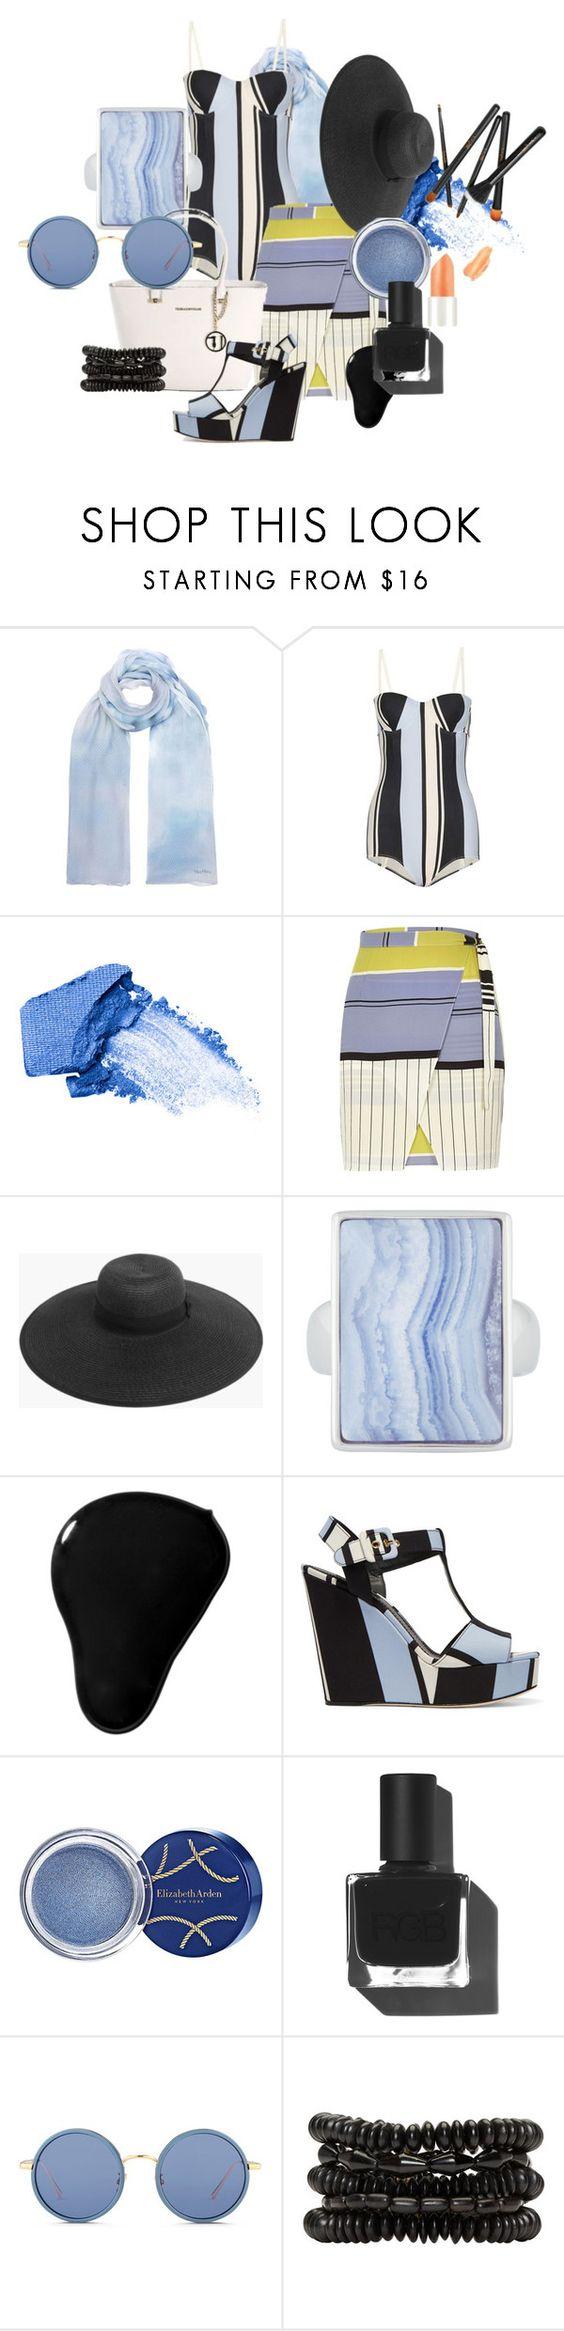 """geometric blues"" by a-kathryn-ethx ❤ liked on Polyvore featuring MaxMara, Dolce&Gabbana, NARS Cosmetics, River Island, Boohoo, Henri Bendel, RGB Cosmetics, Trussardi, Elizabeth Arden and Linda Farrow"